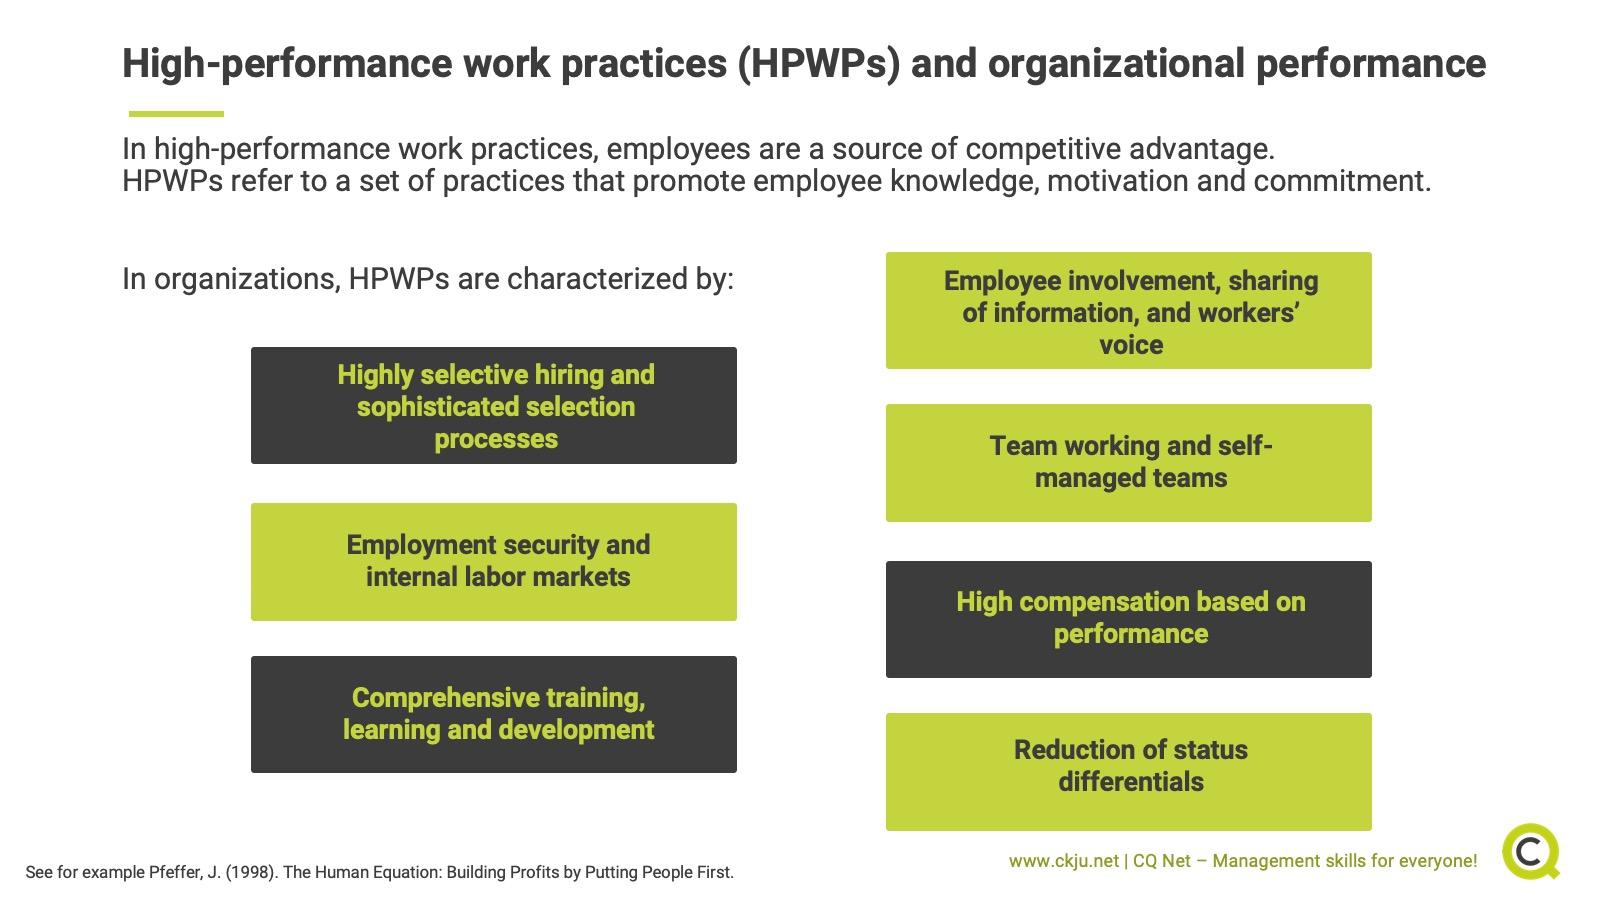 High-performance work practices help improve organizational performance